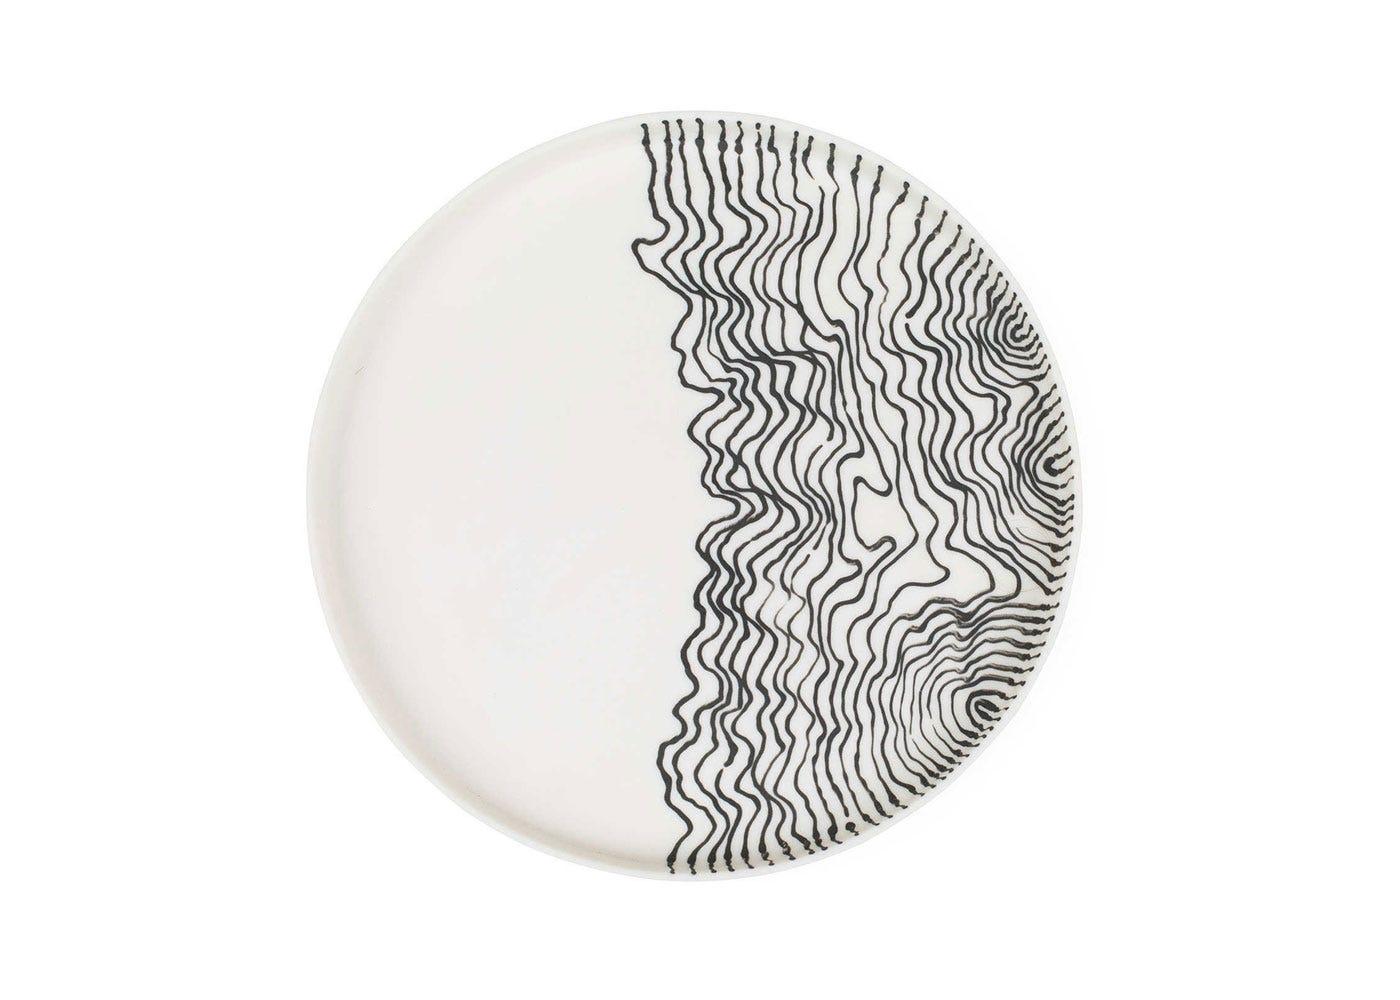 Estuarine plate white small front view